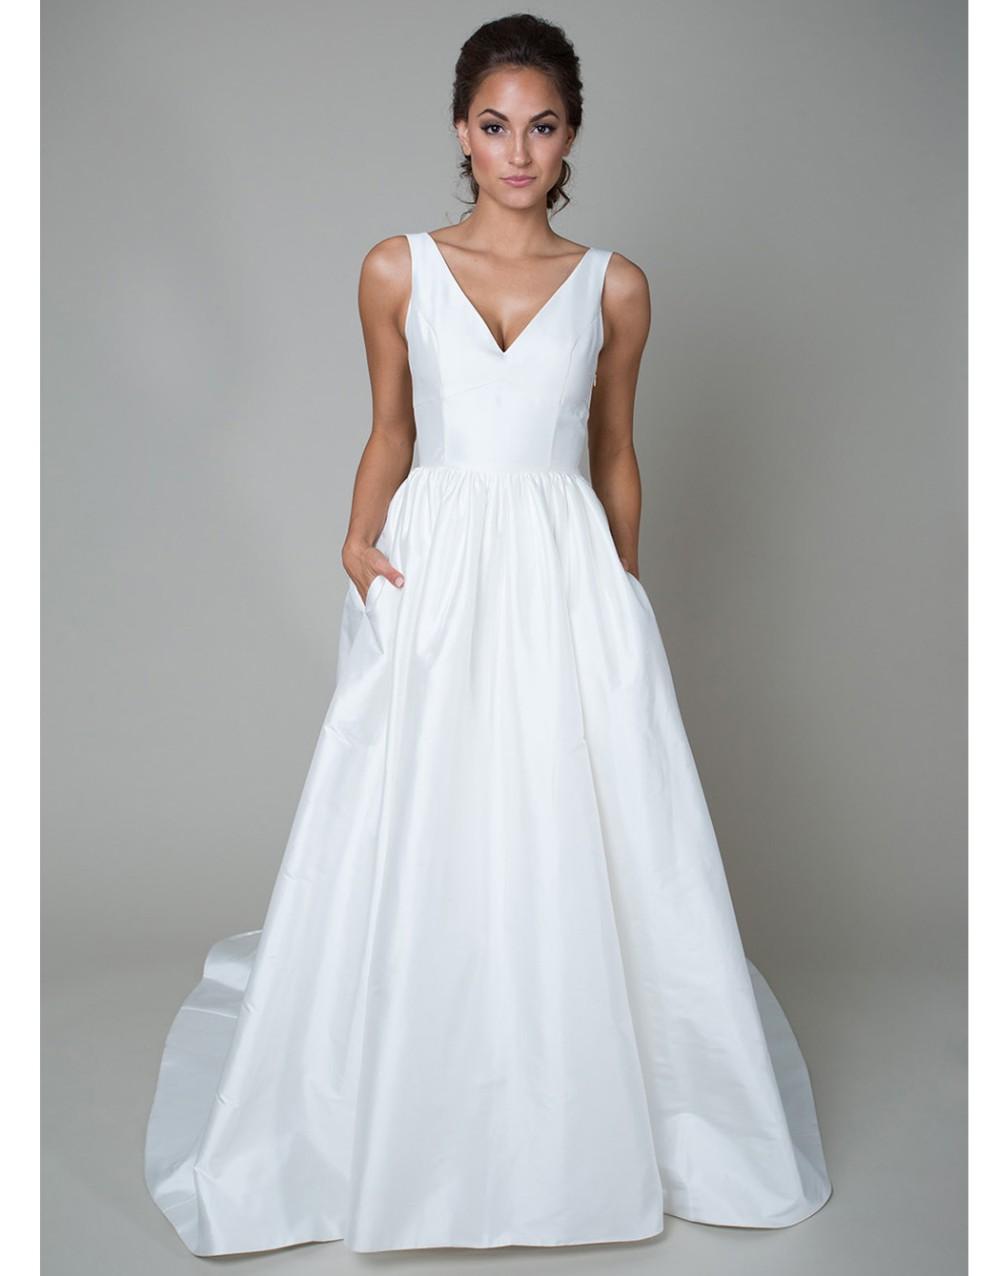 Vintage long white summer boho beach wedding dress with pockets 2015 v neck see through bridal gowns vestidos de noiva UD-442 1